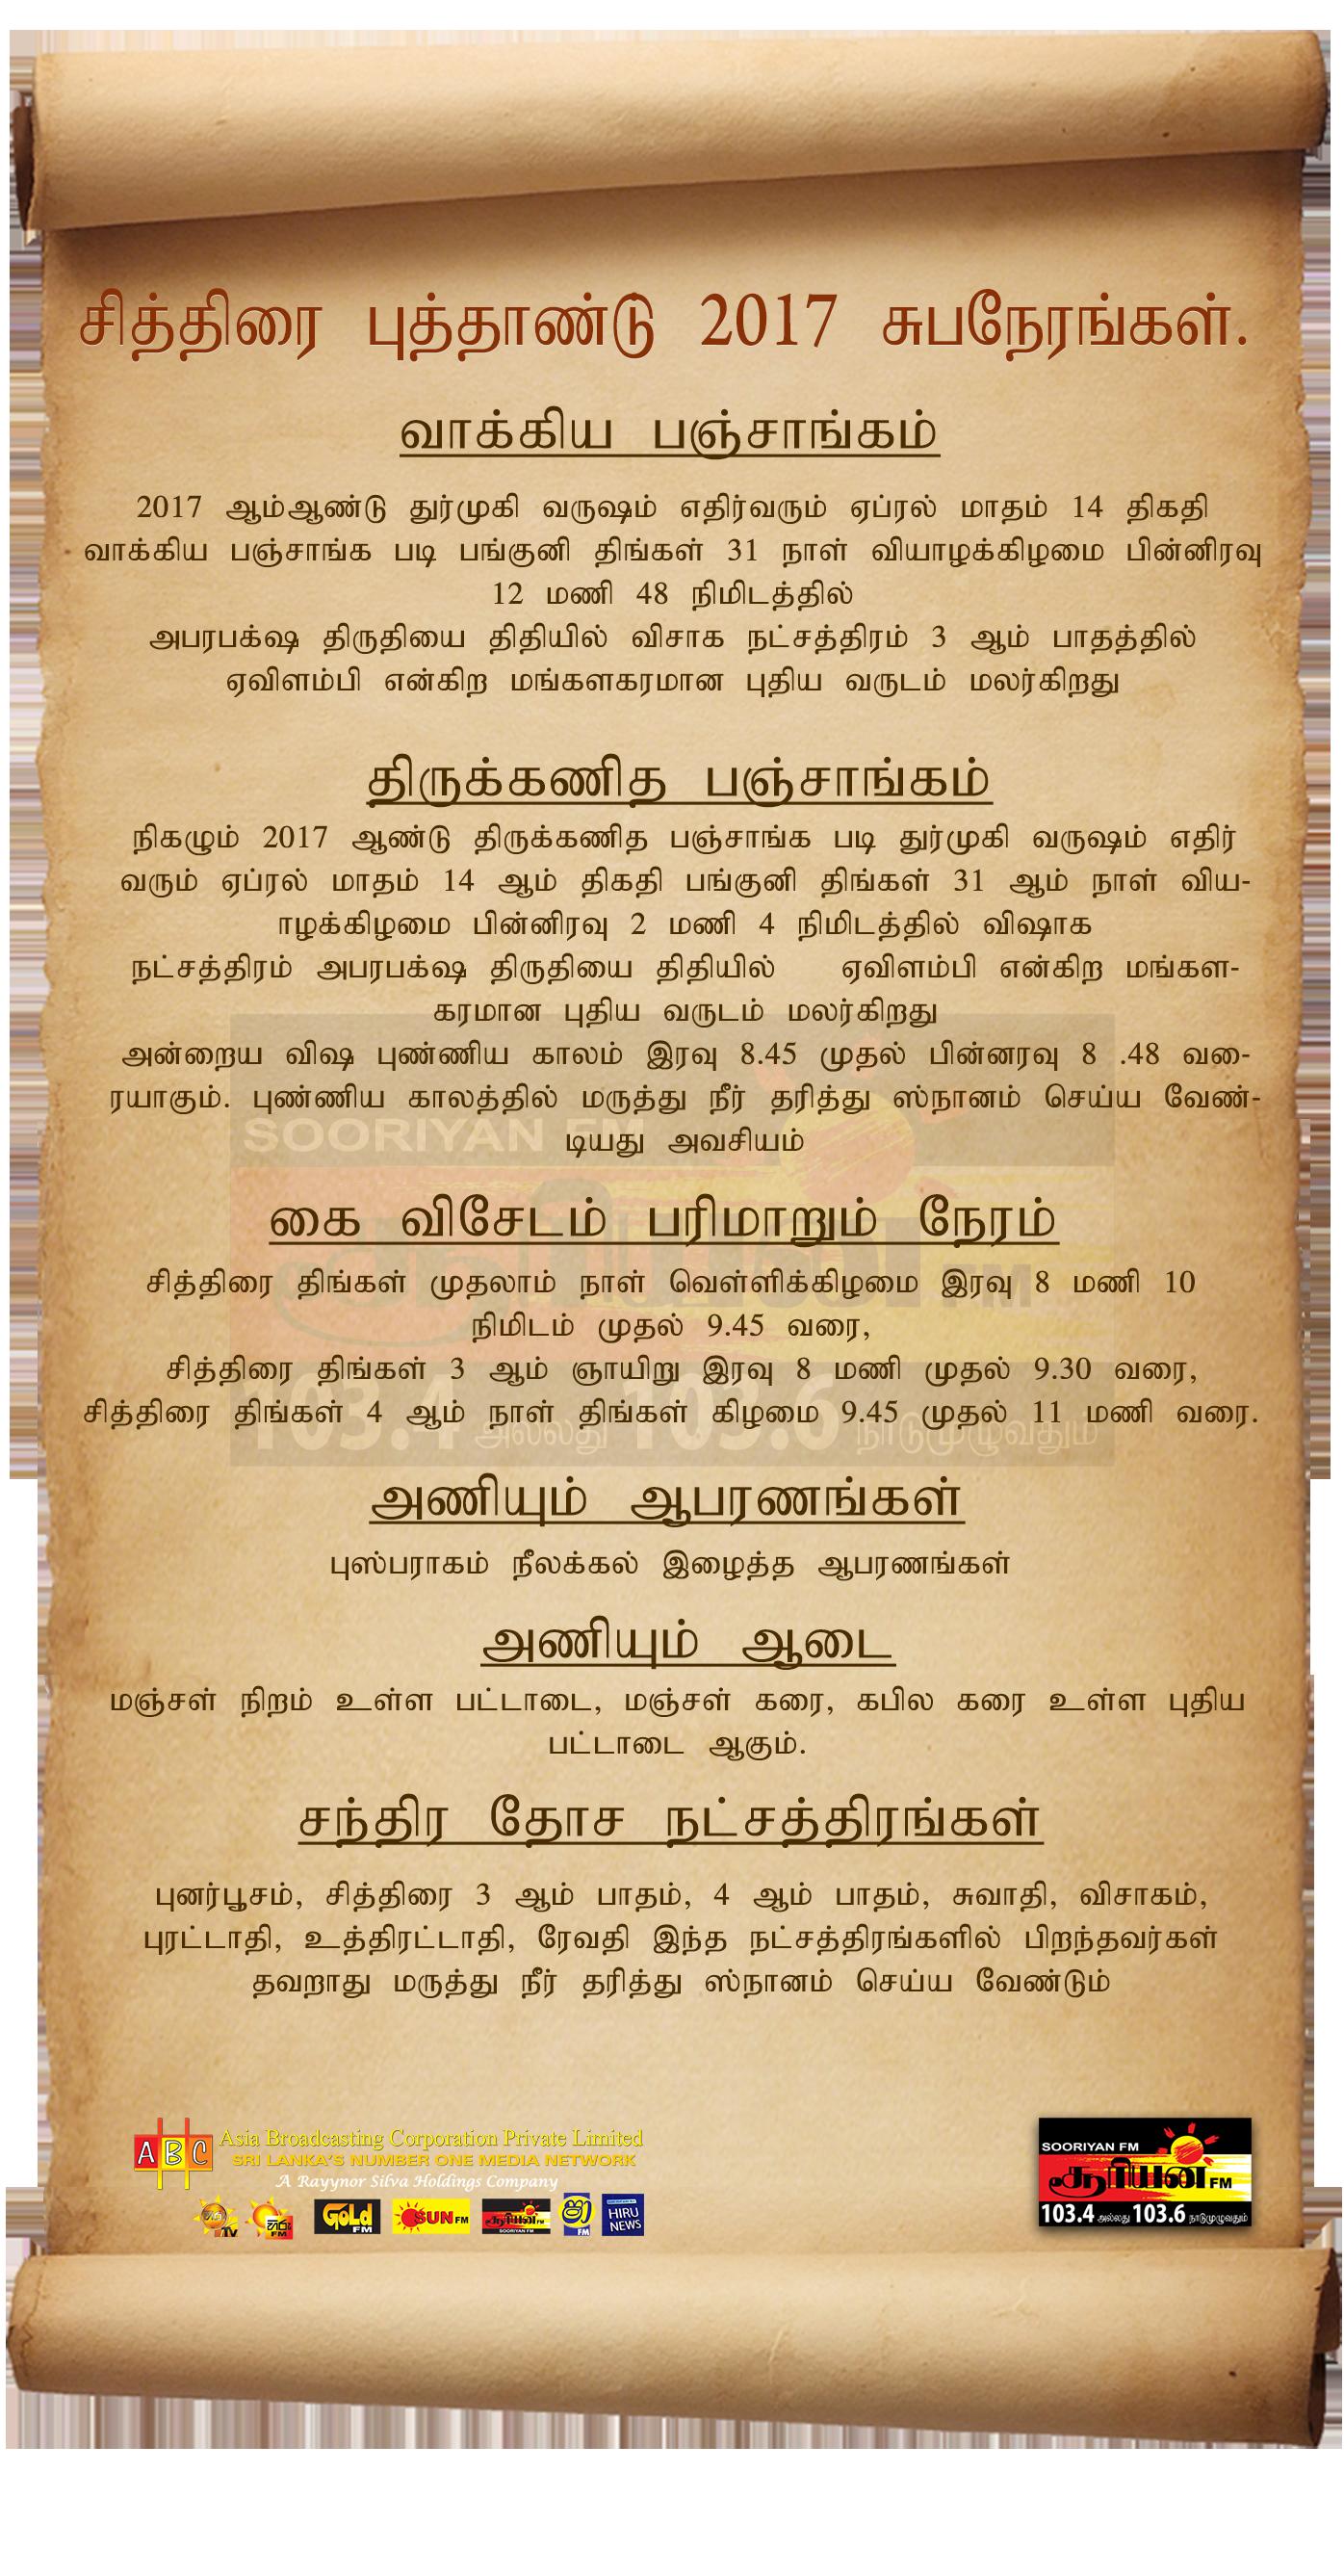 2017 Sinhala Litha >> 2017 Sinhala Tamil Aluth Avurudu Litha   2017 Sinhala New Year Litha   2017 Tamil New Year ...